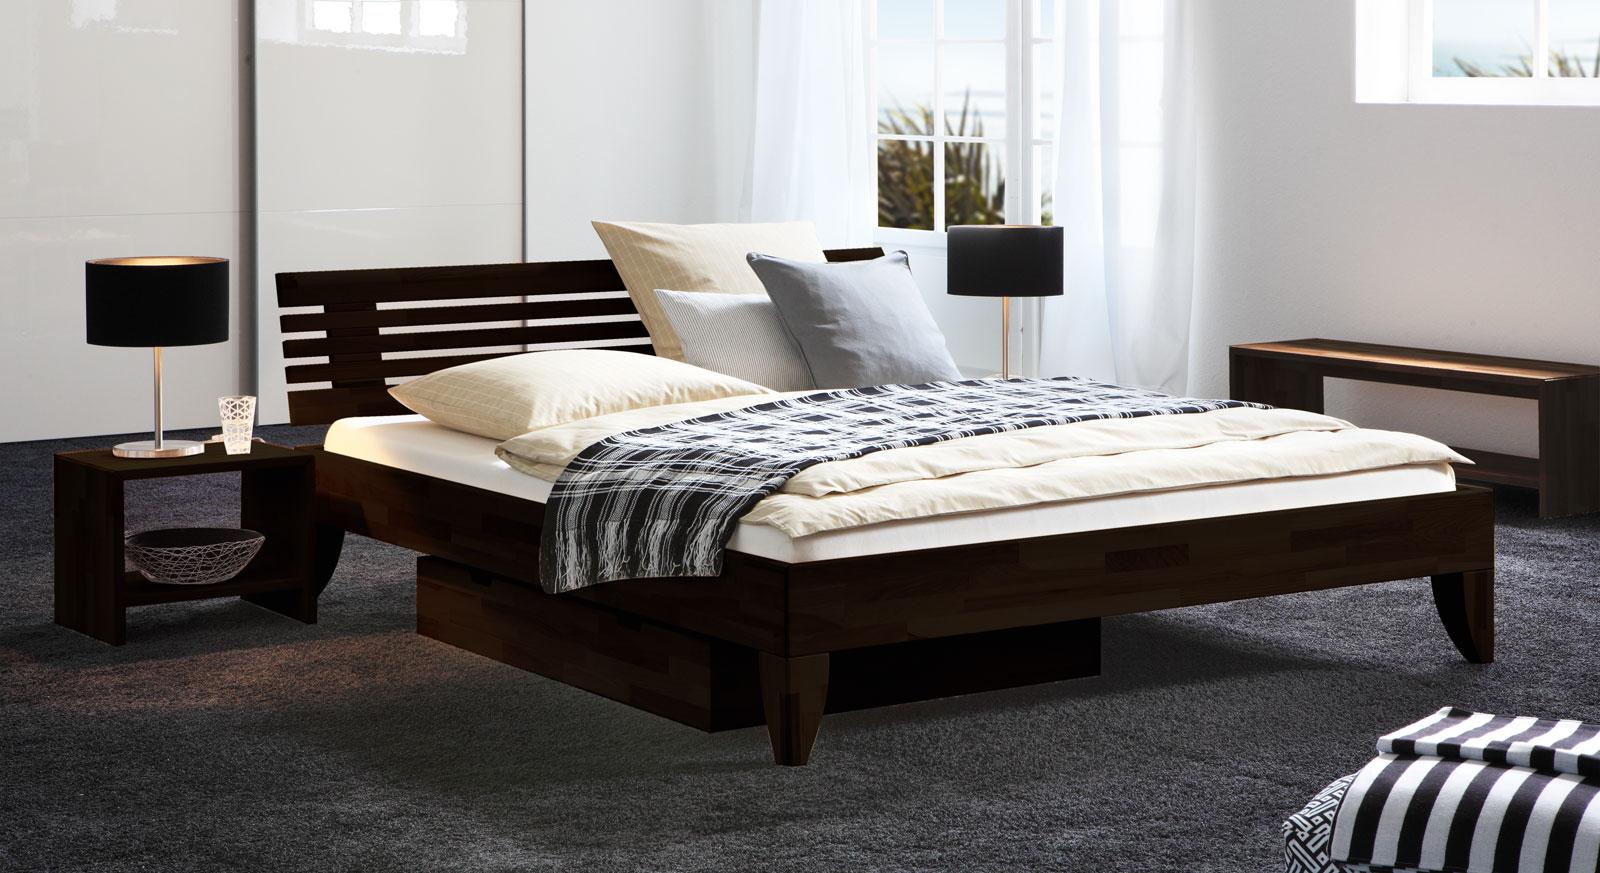 Dunkles Doppelbett aus massivem Buchenholz - Bett Fontana